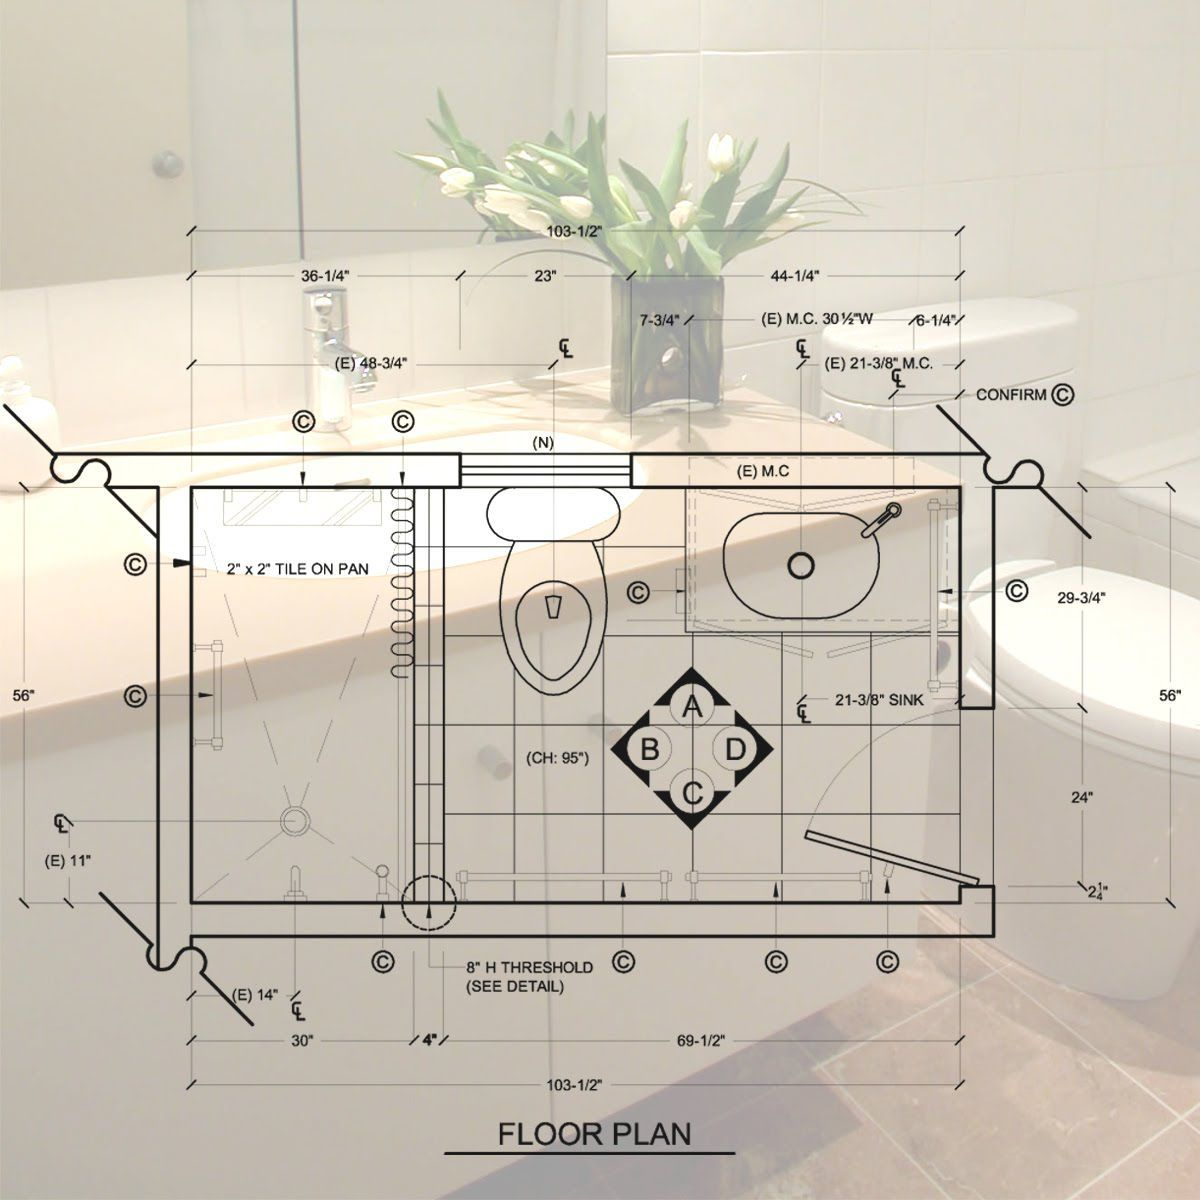 8 x 7 bathroom layout ideas master bath function ideas and layout rh pinterest com